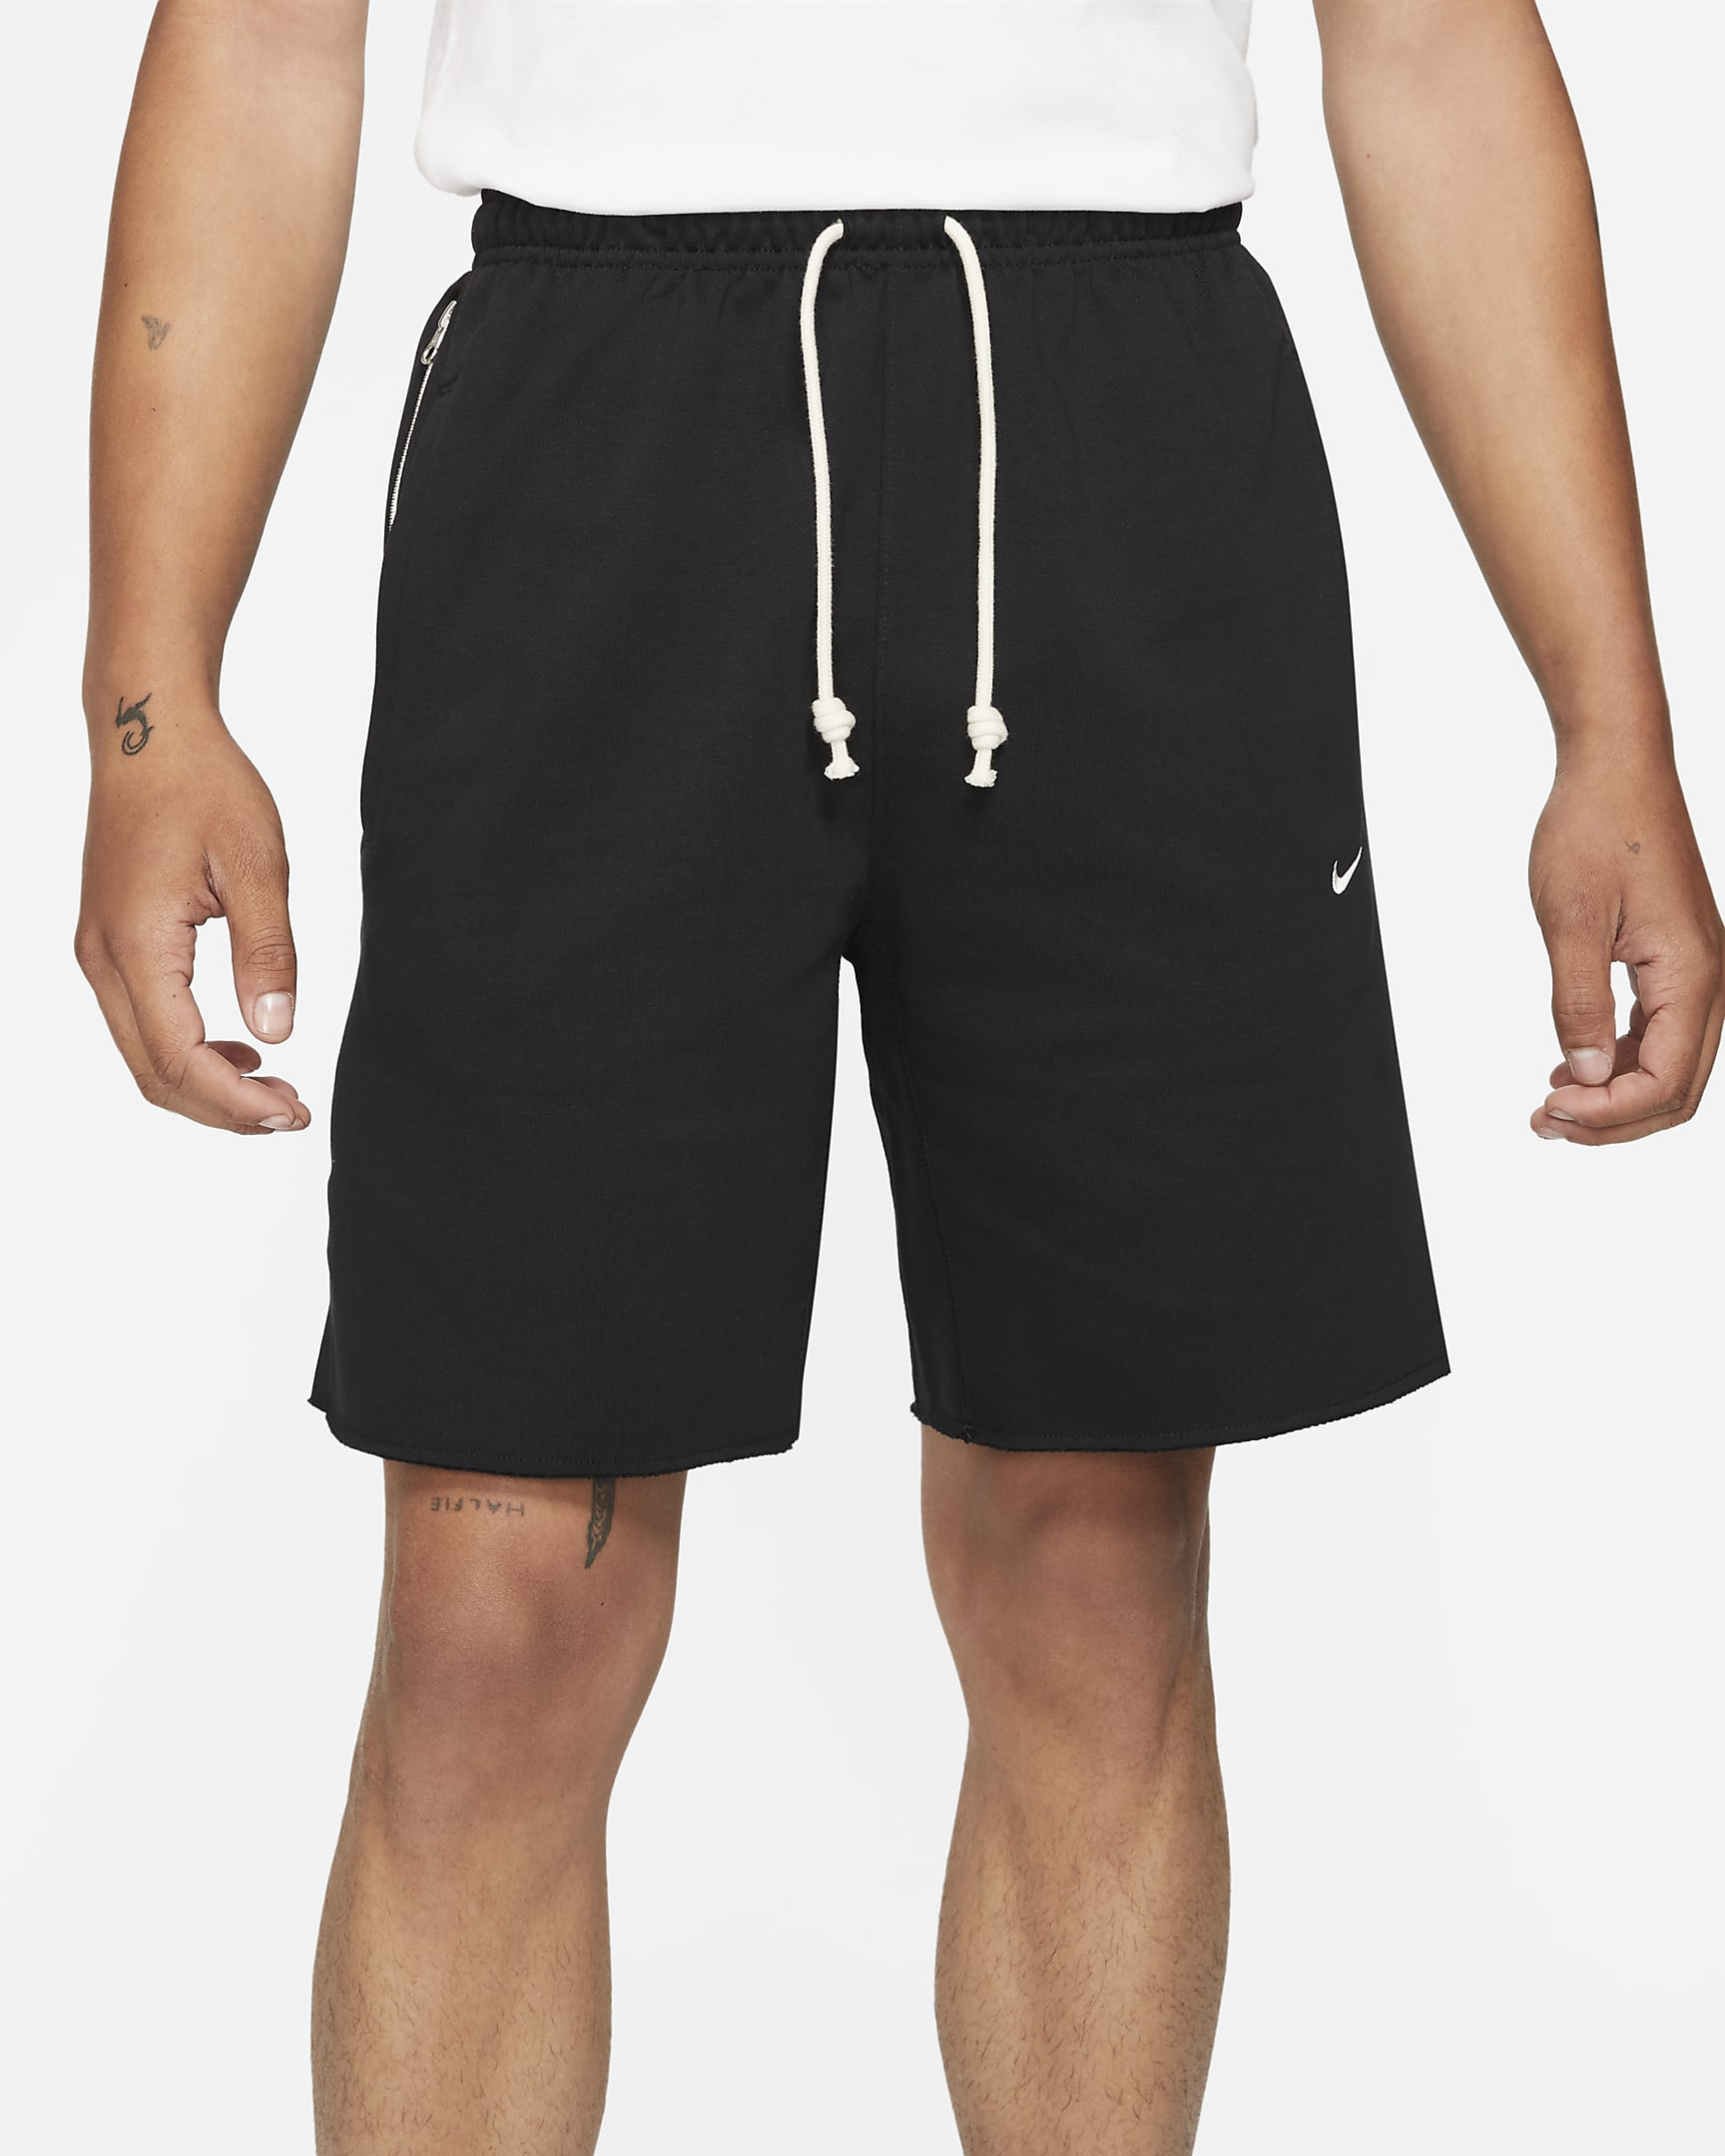 standard-issue-ny-vs-ny-mens-basketball-fleece-shorts-pv03s9-1.png